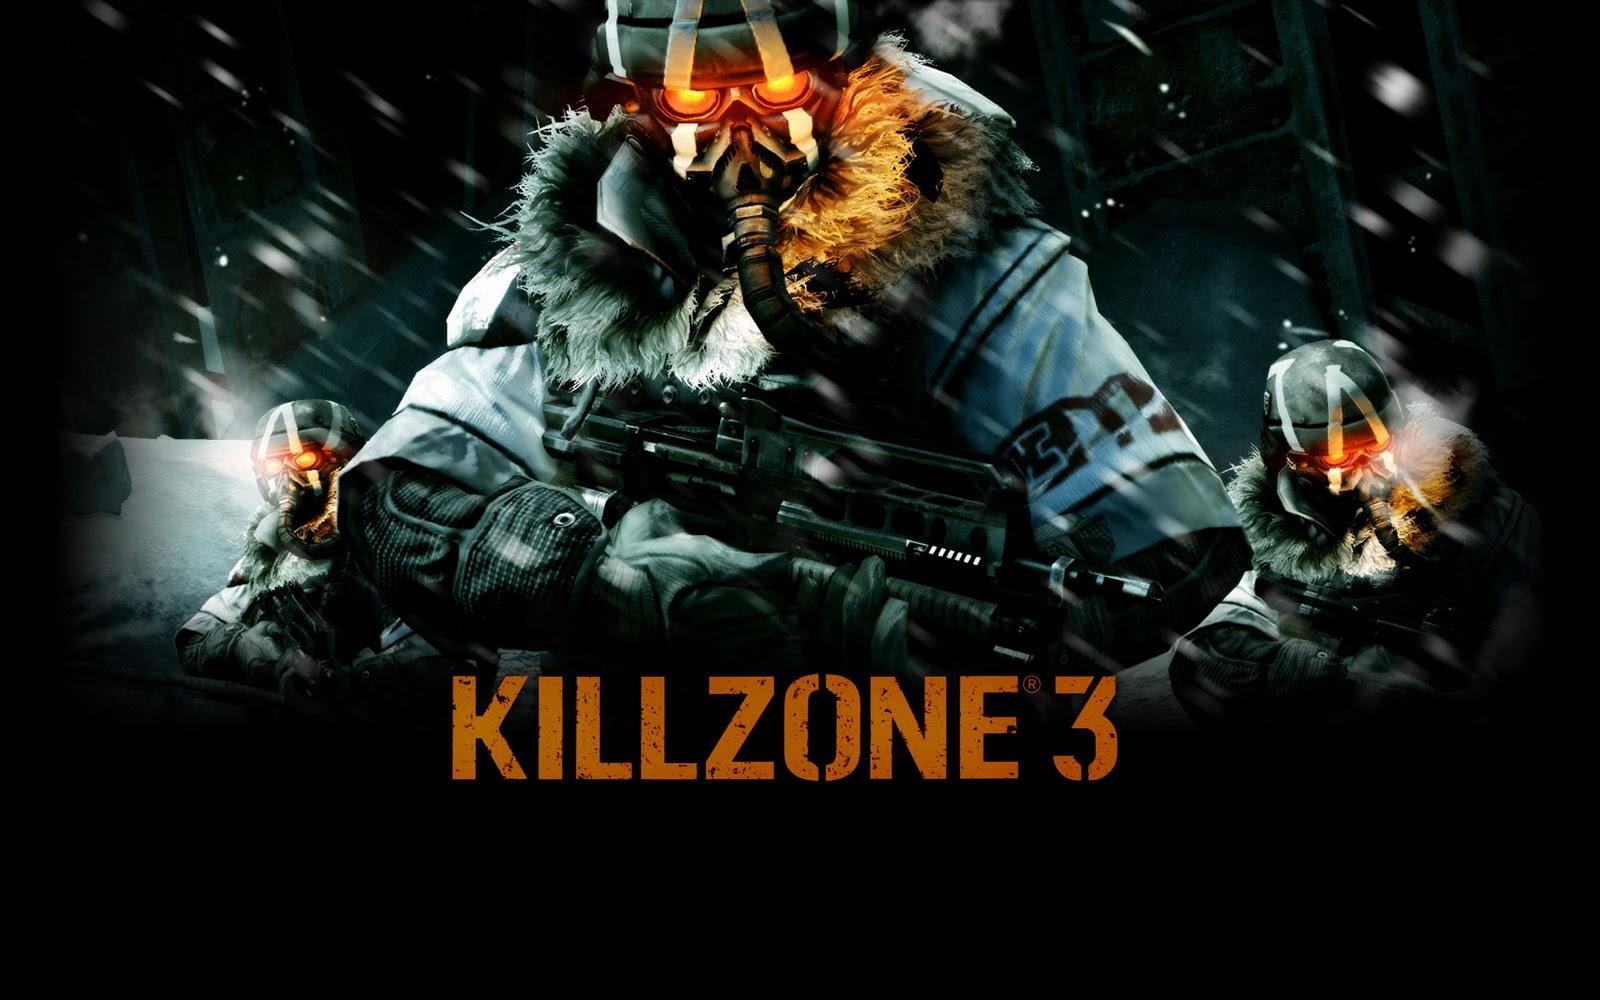 http://4.bp.blogspot.com/-Q2hDe-kfCTU/TVluJfbjT_I/AAAAAAAAAI0/DYMf2MZOWDg/s1600/killzone3wallpaper.jpg